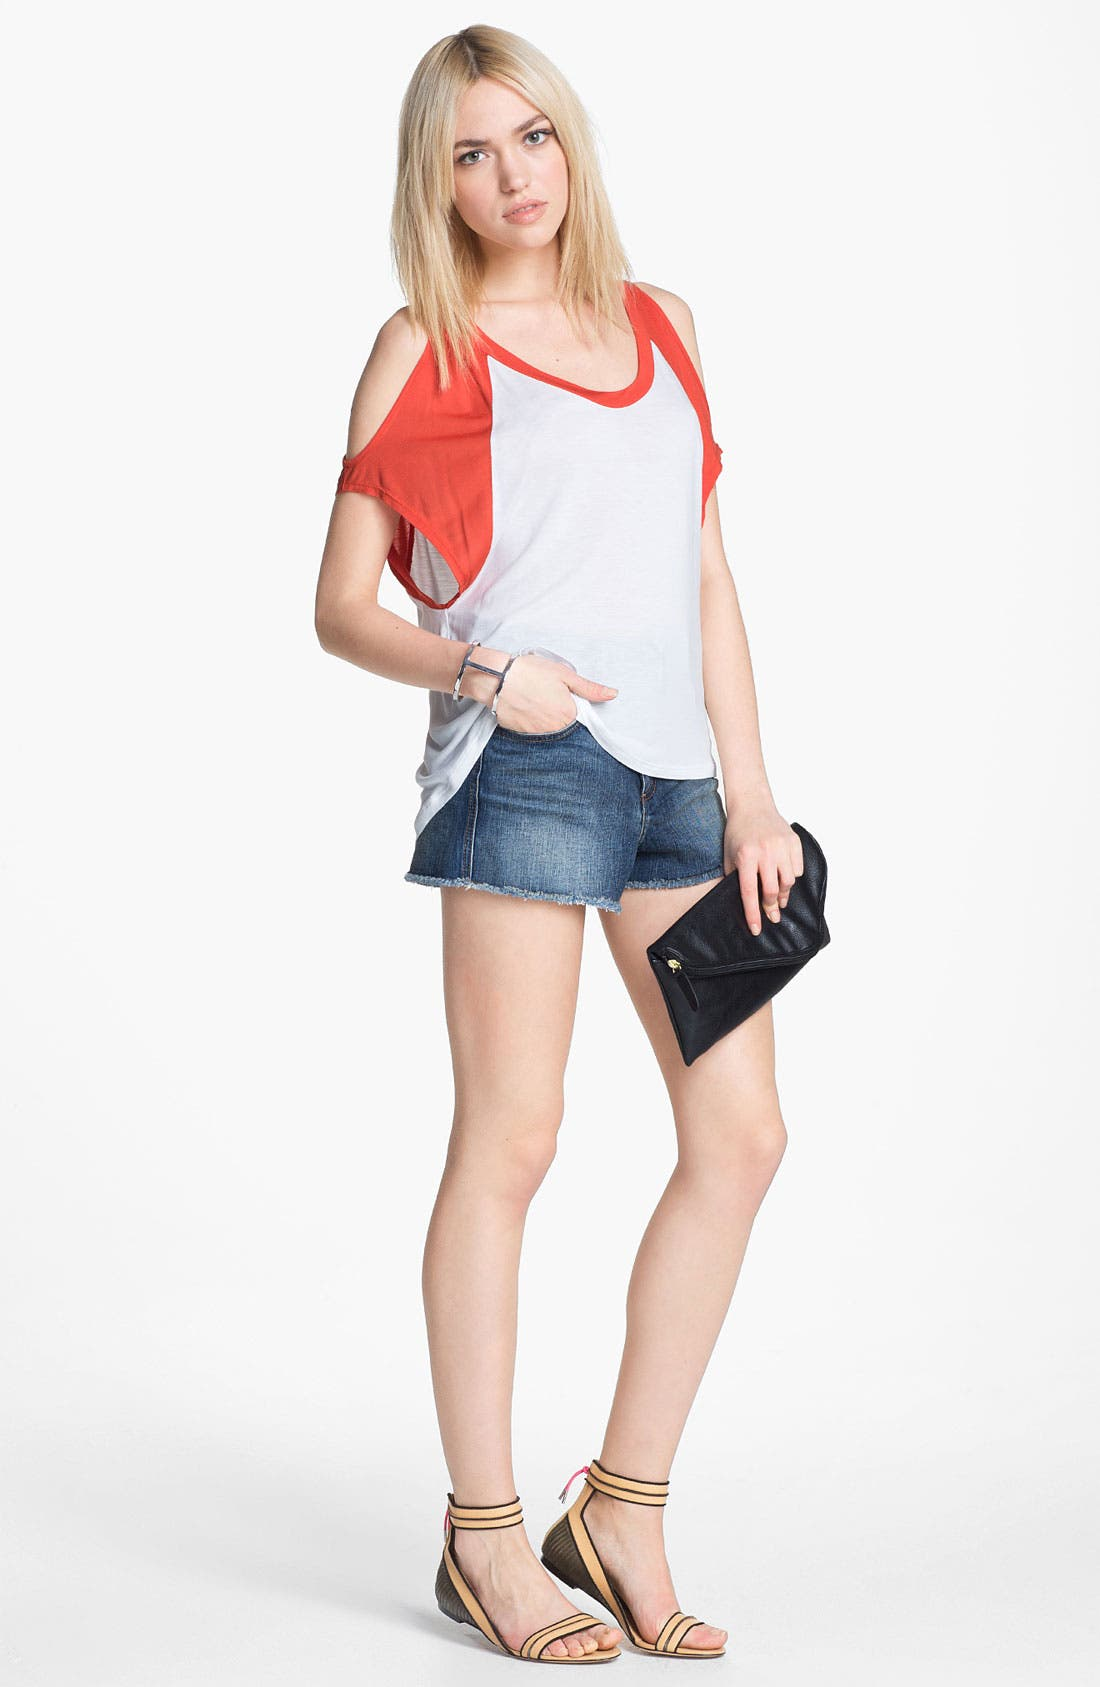 Main Image - Piper Top & Edyson High Waisted Cutoff Shorts